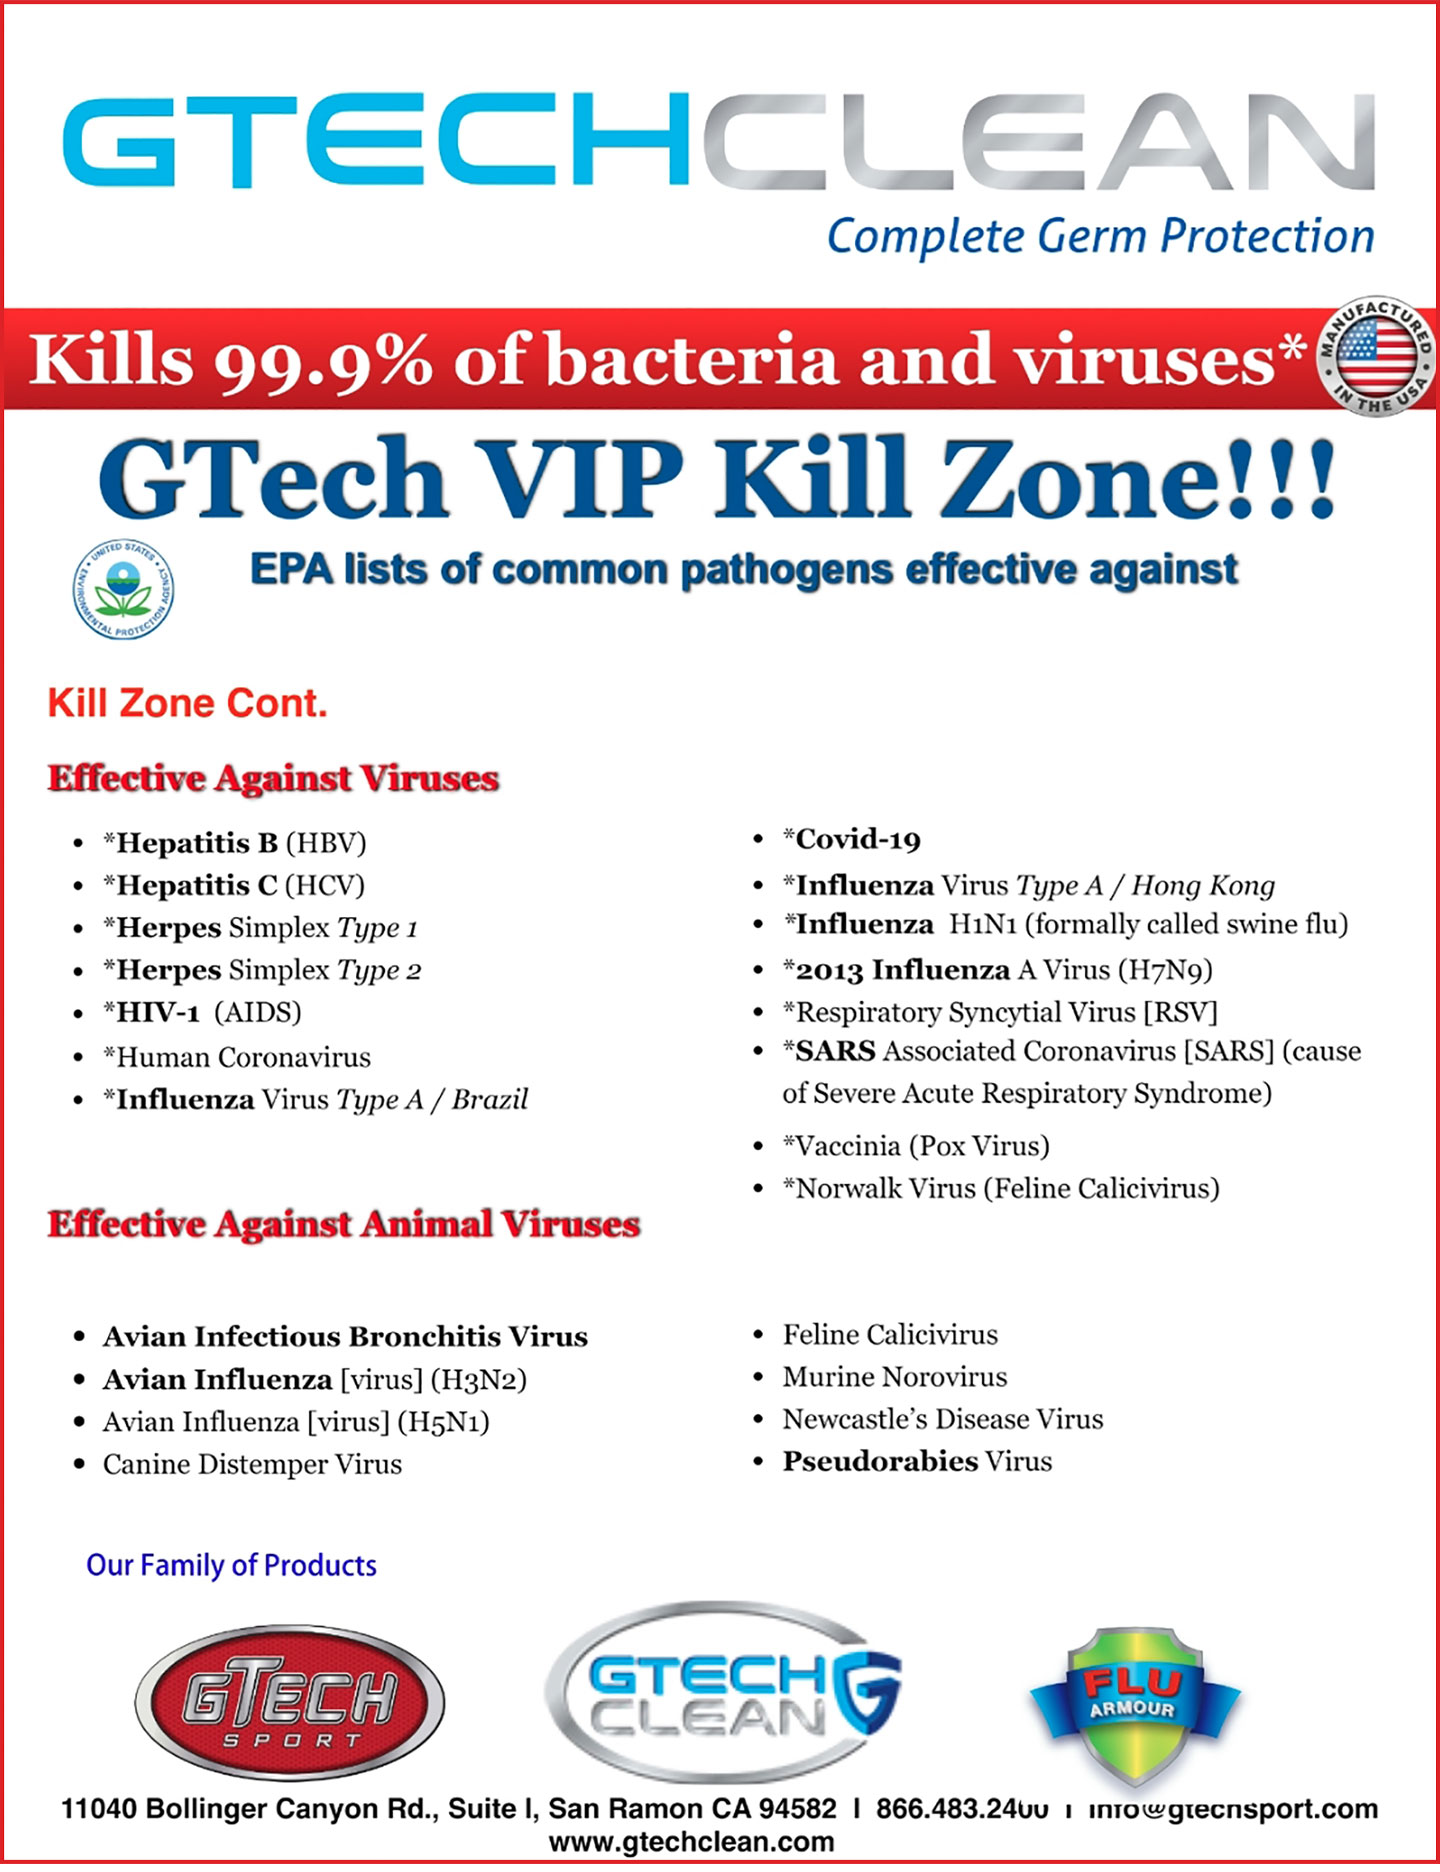 GTECH CLEAN Complete Germ Protection